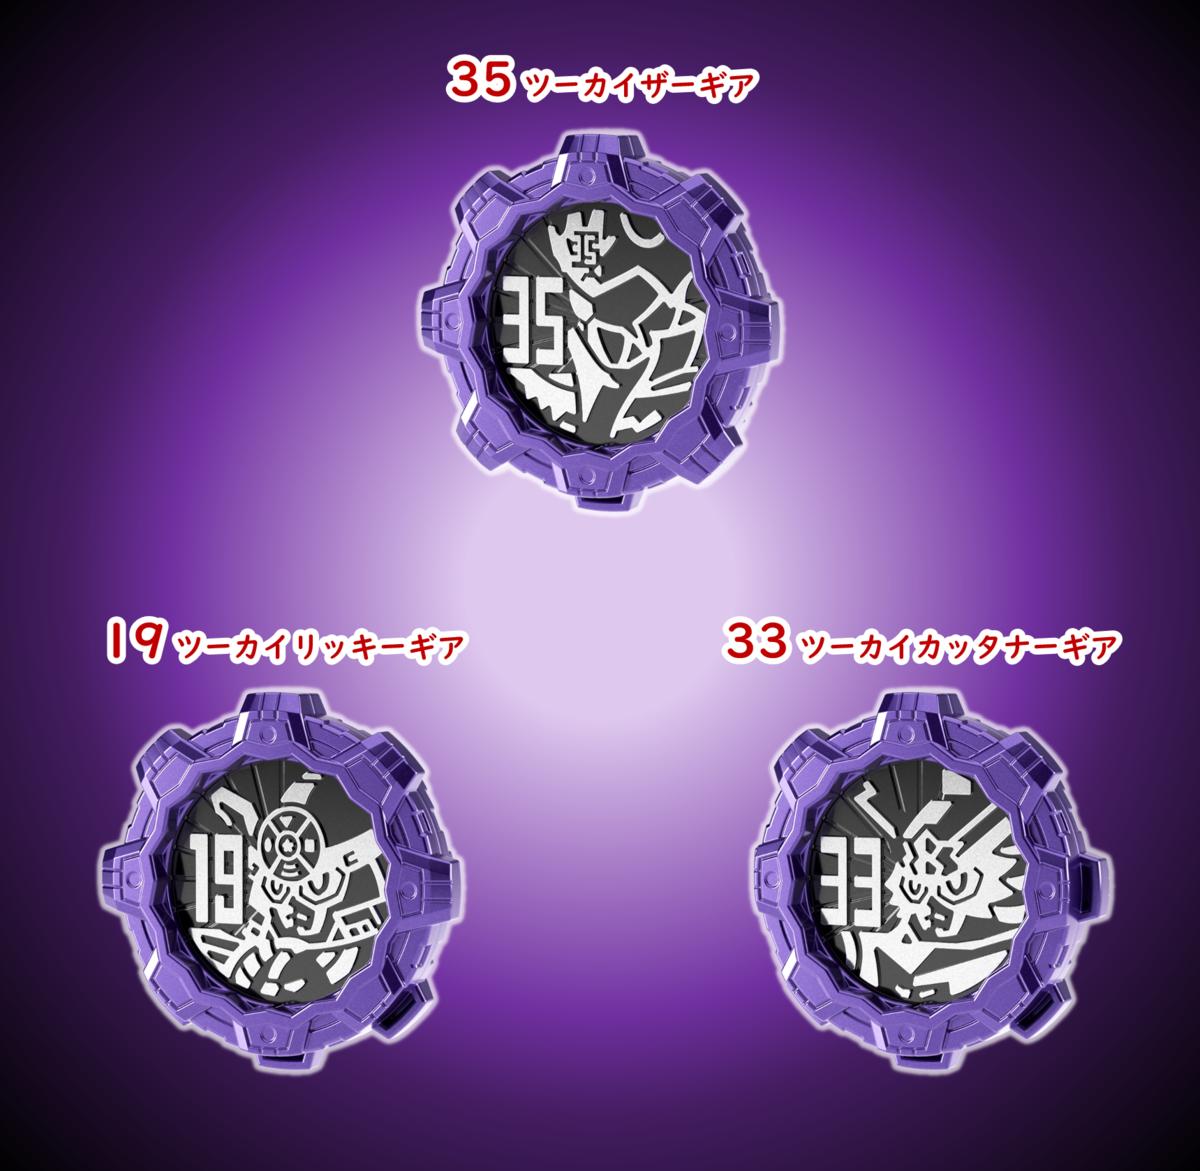 f:id:candywrite:20210826185828p:plain